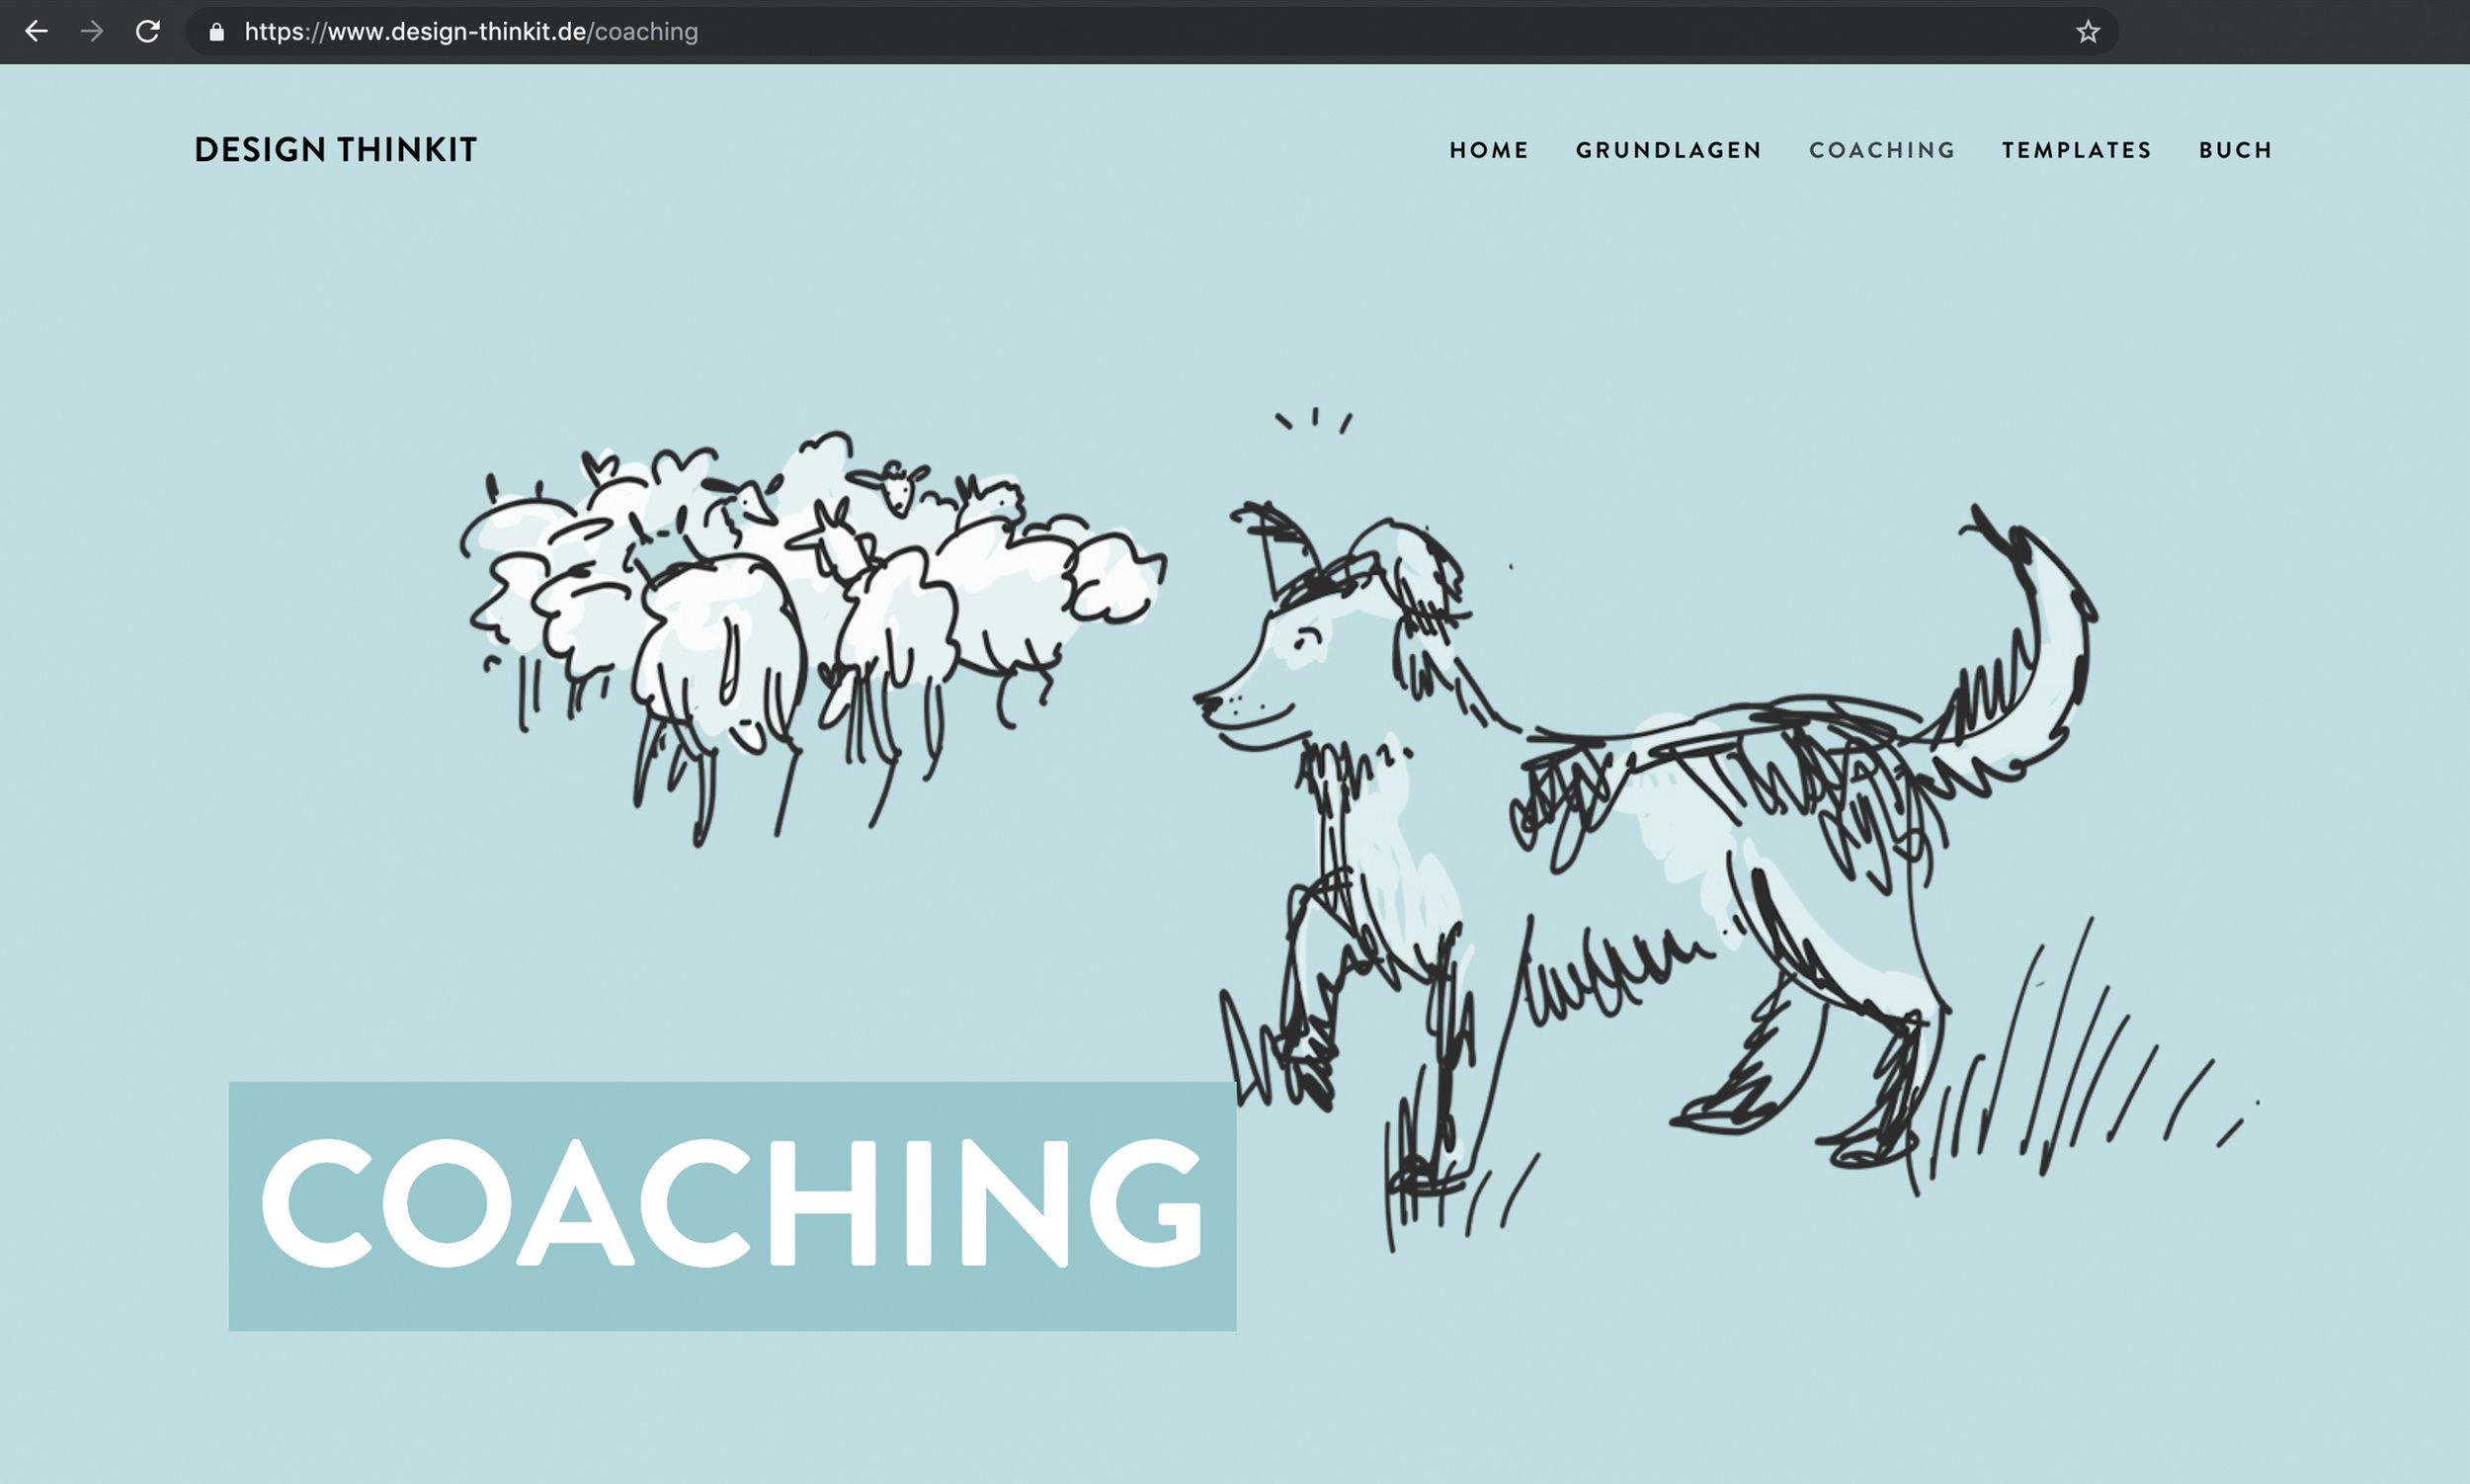 Unterseite Coaching: Design Thinking Coaching Tipps & Infos auf Design-Thinkit.de